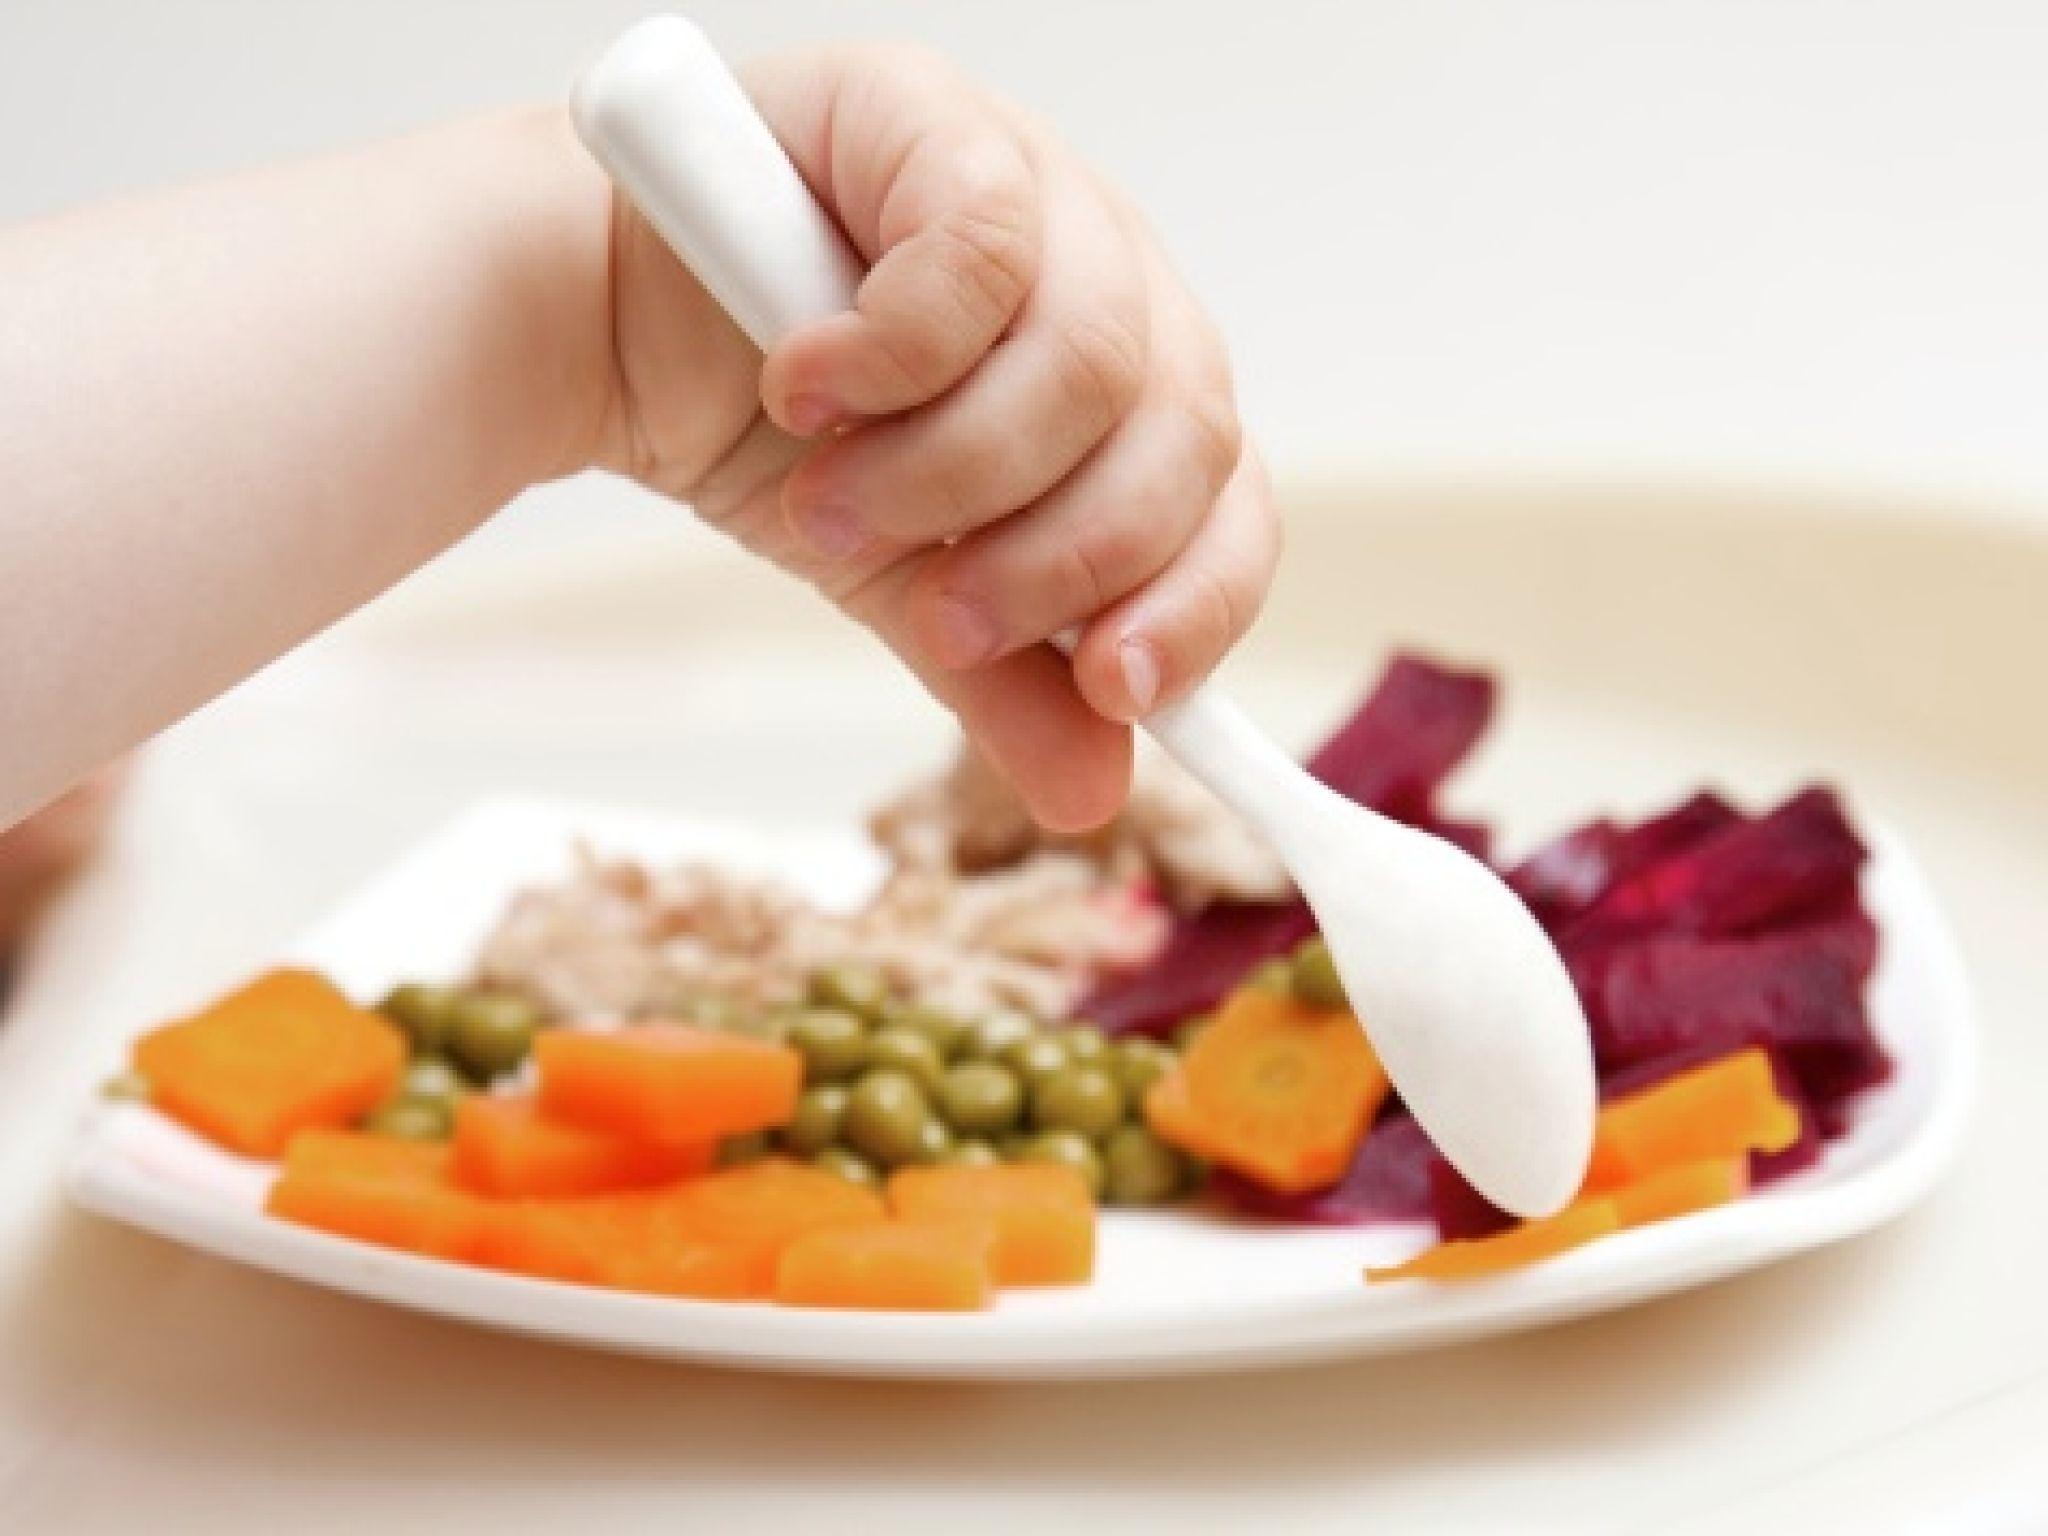 kids-nutrition_s4x3_jpg_rend_sniipadlarge.jpeg